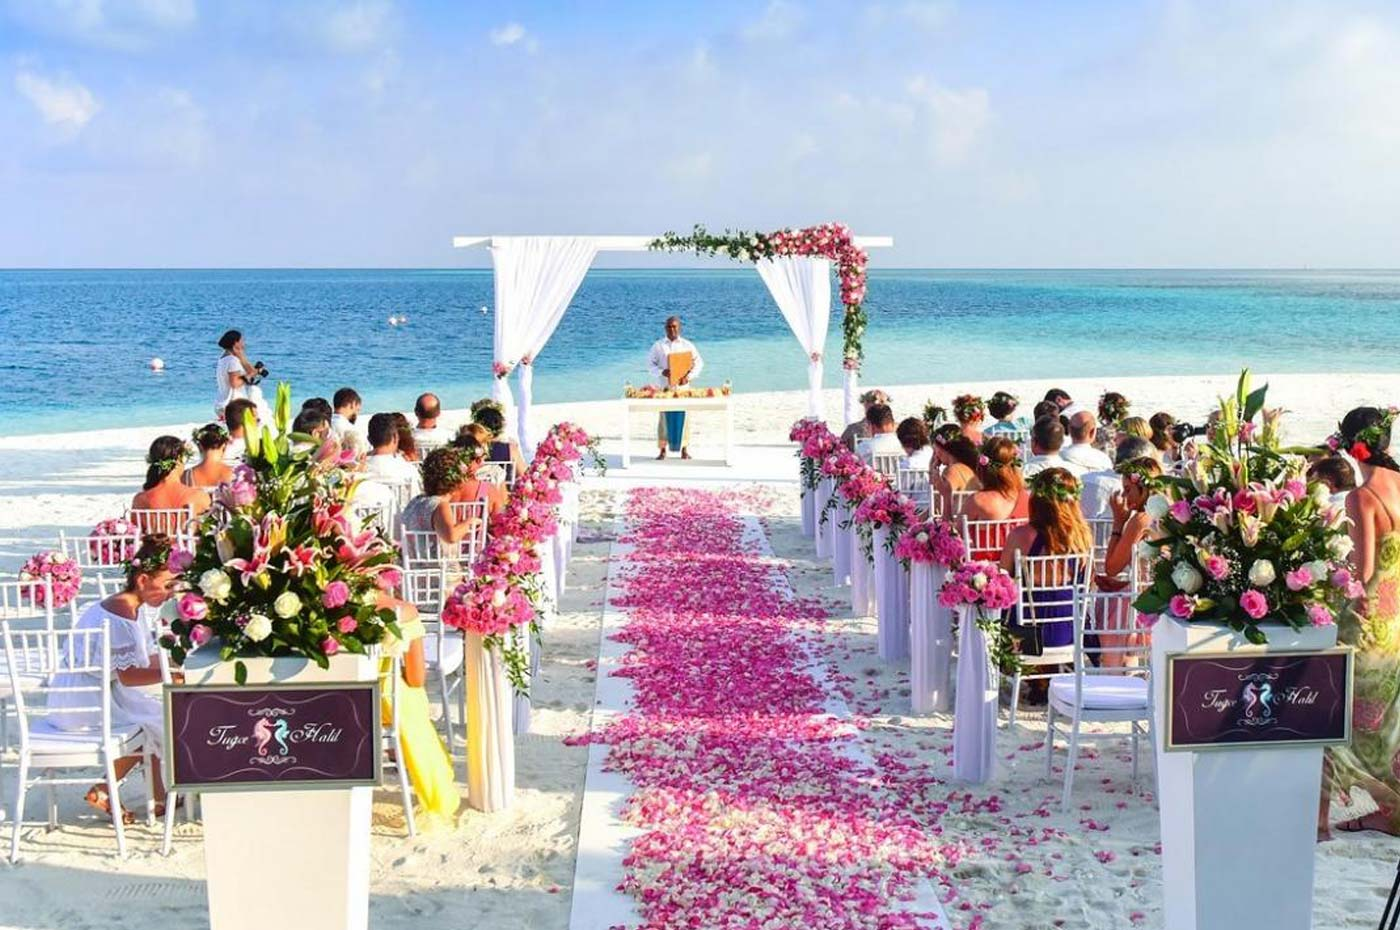 The advantages of a destination wedding